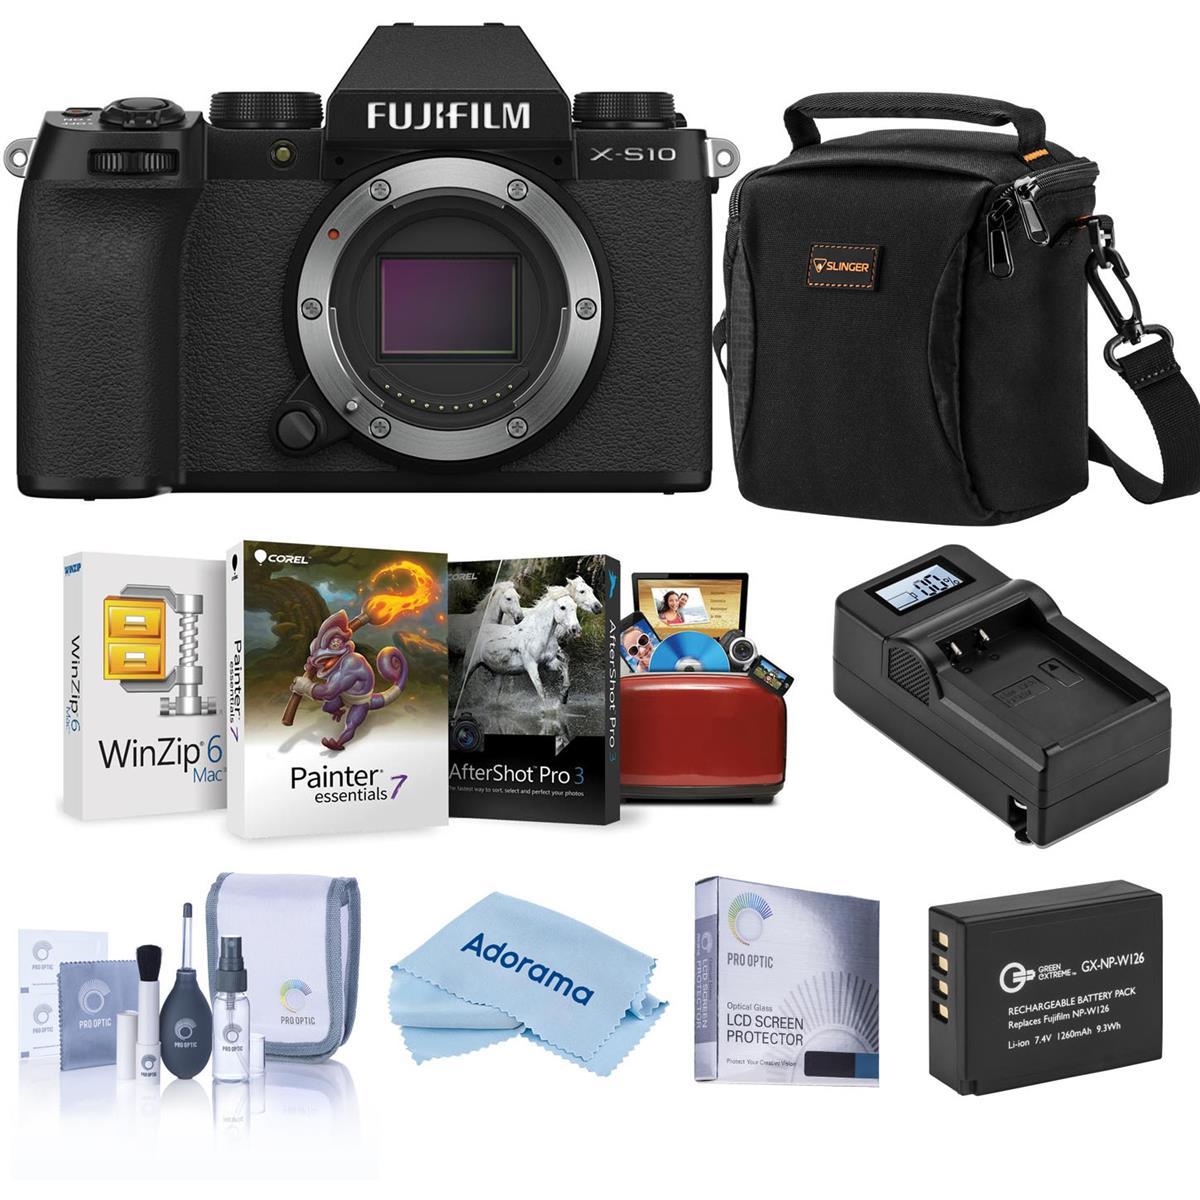 Fujifilm X-S10 Mirrorless Camera, Black - Bundle with Free Accessories & Mac Software Suite